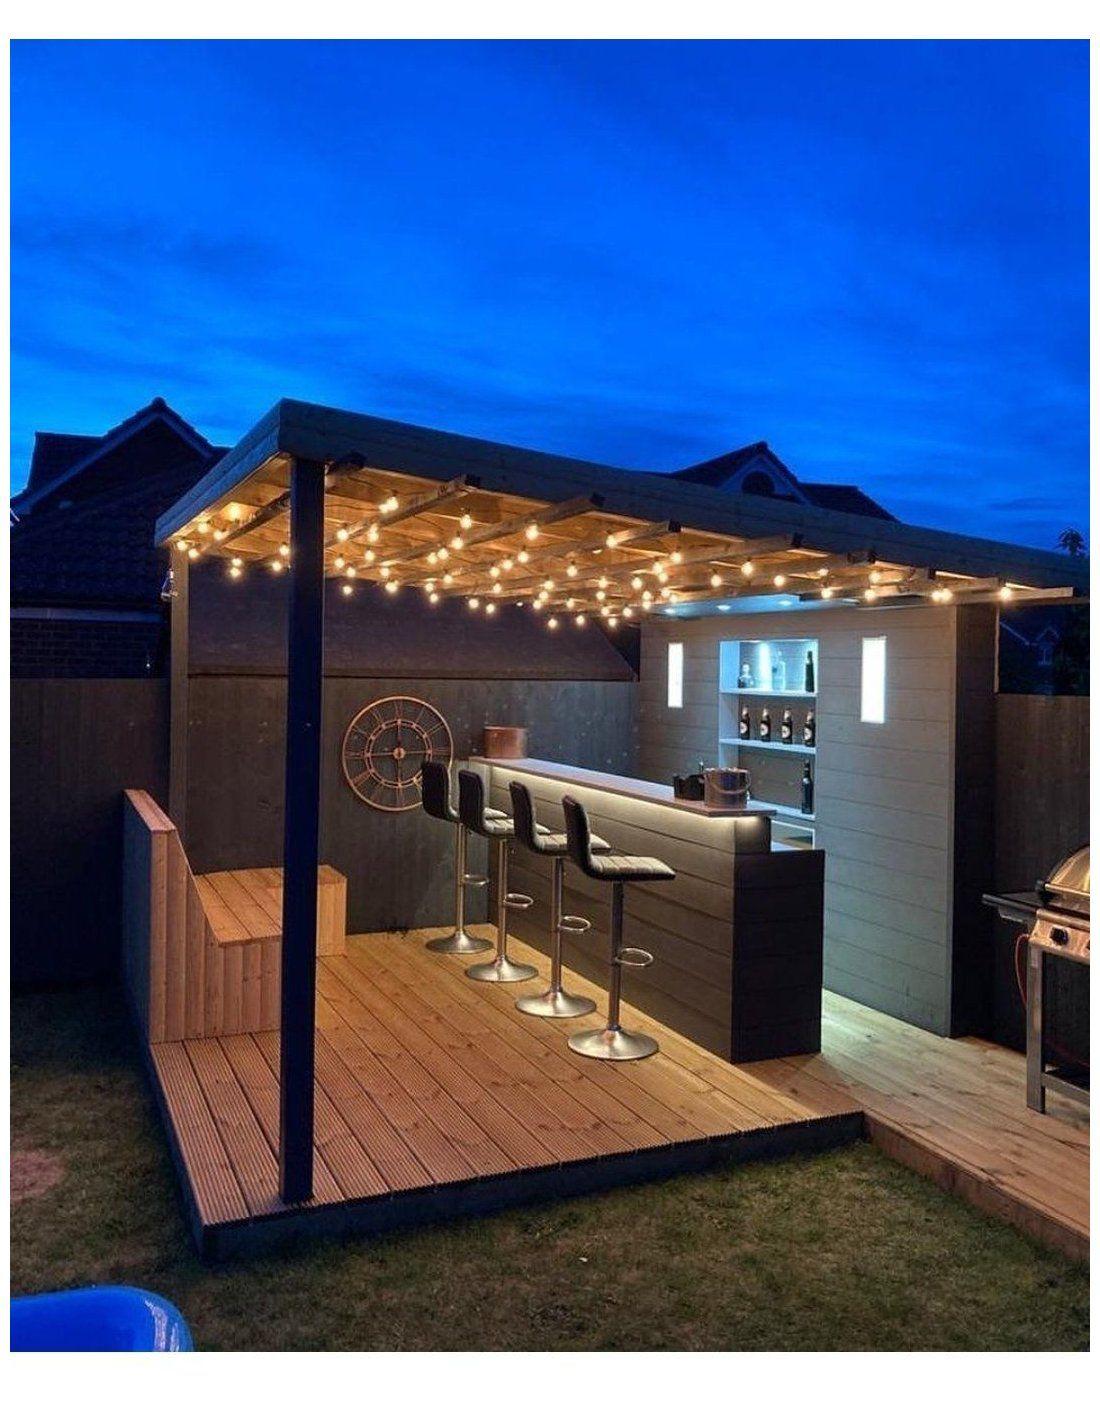 19 Backyard Bars For The Perfect Happy Hour At Home Build Beautiful Luxurious Backyard Backyard Bar Backyard Patio Designs